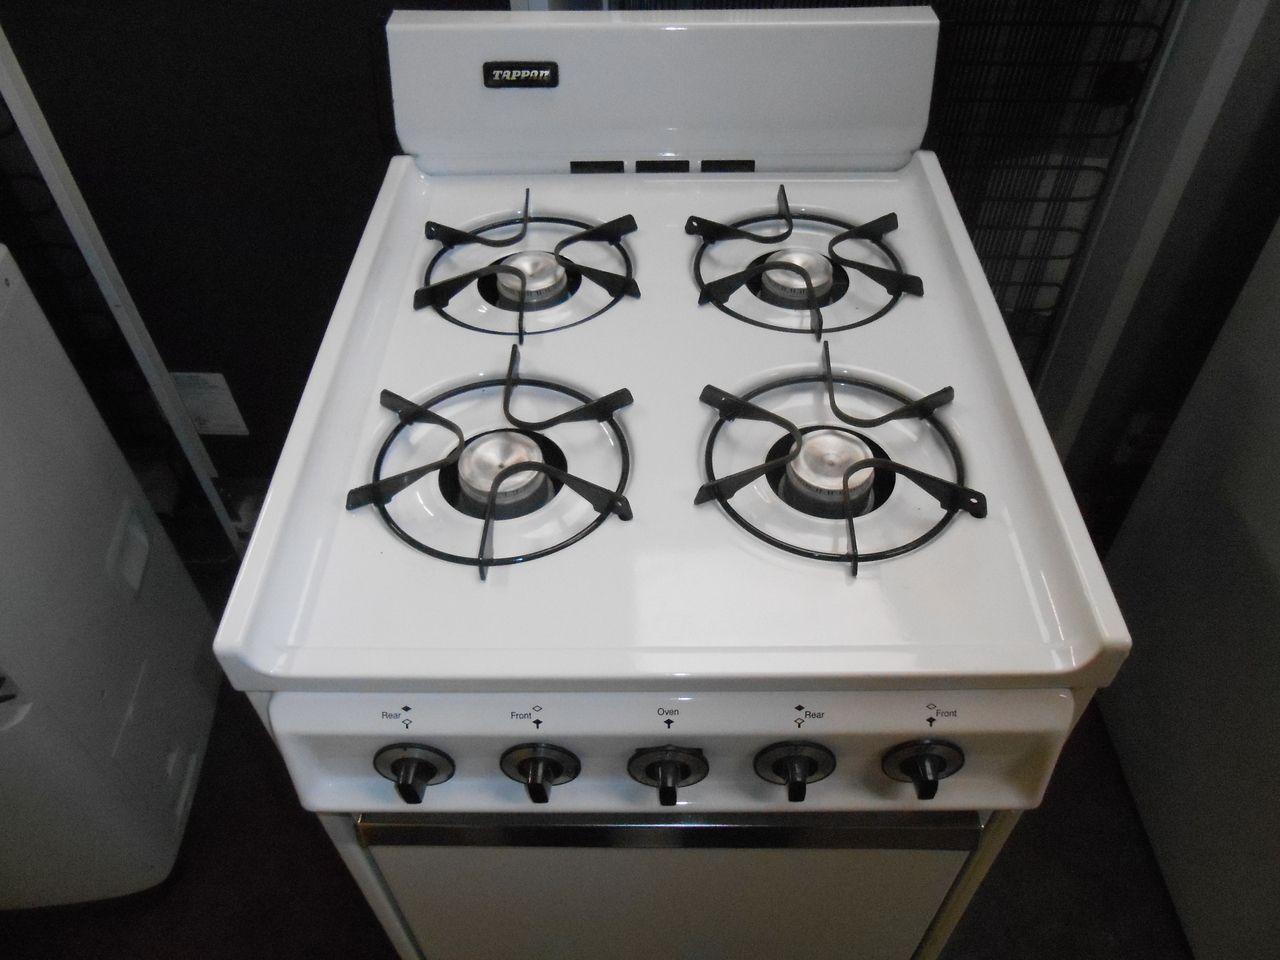 Uncategorized Kitchen Appliance City appliance city tappan 20 inch gas range 4 burner broiler on bottom drawer 2 oven